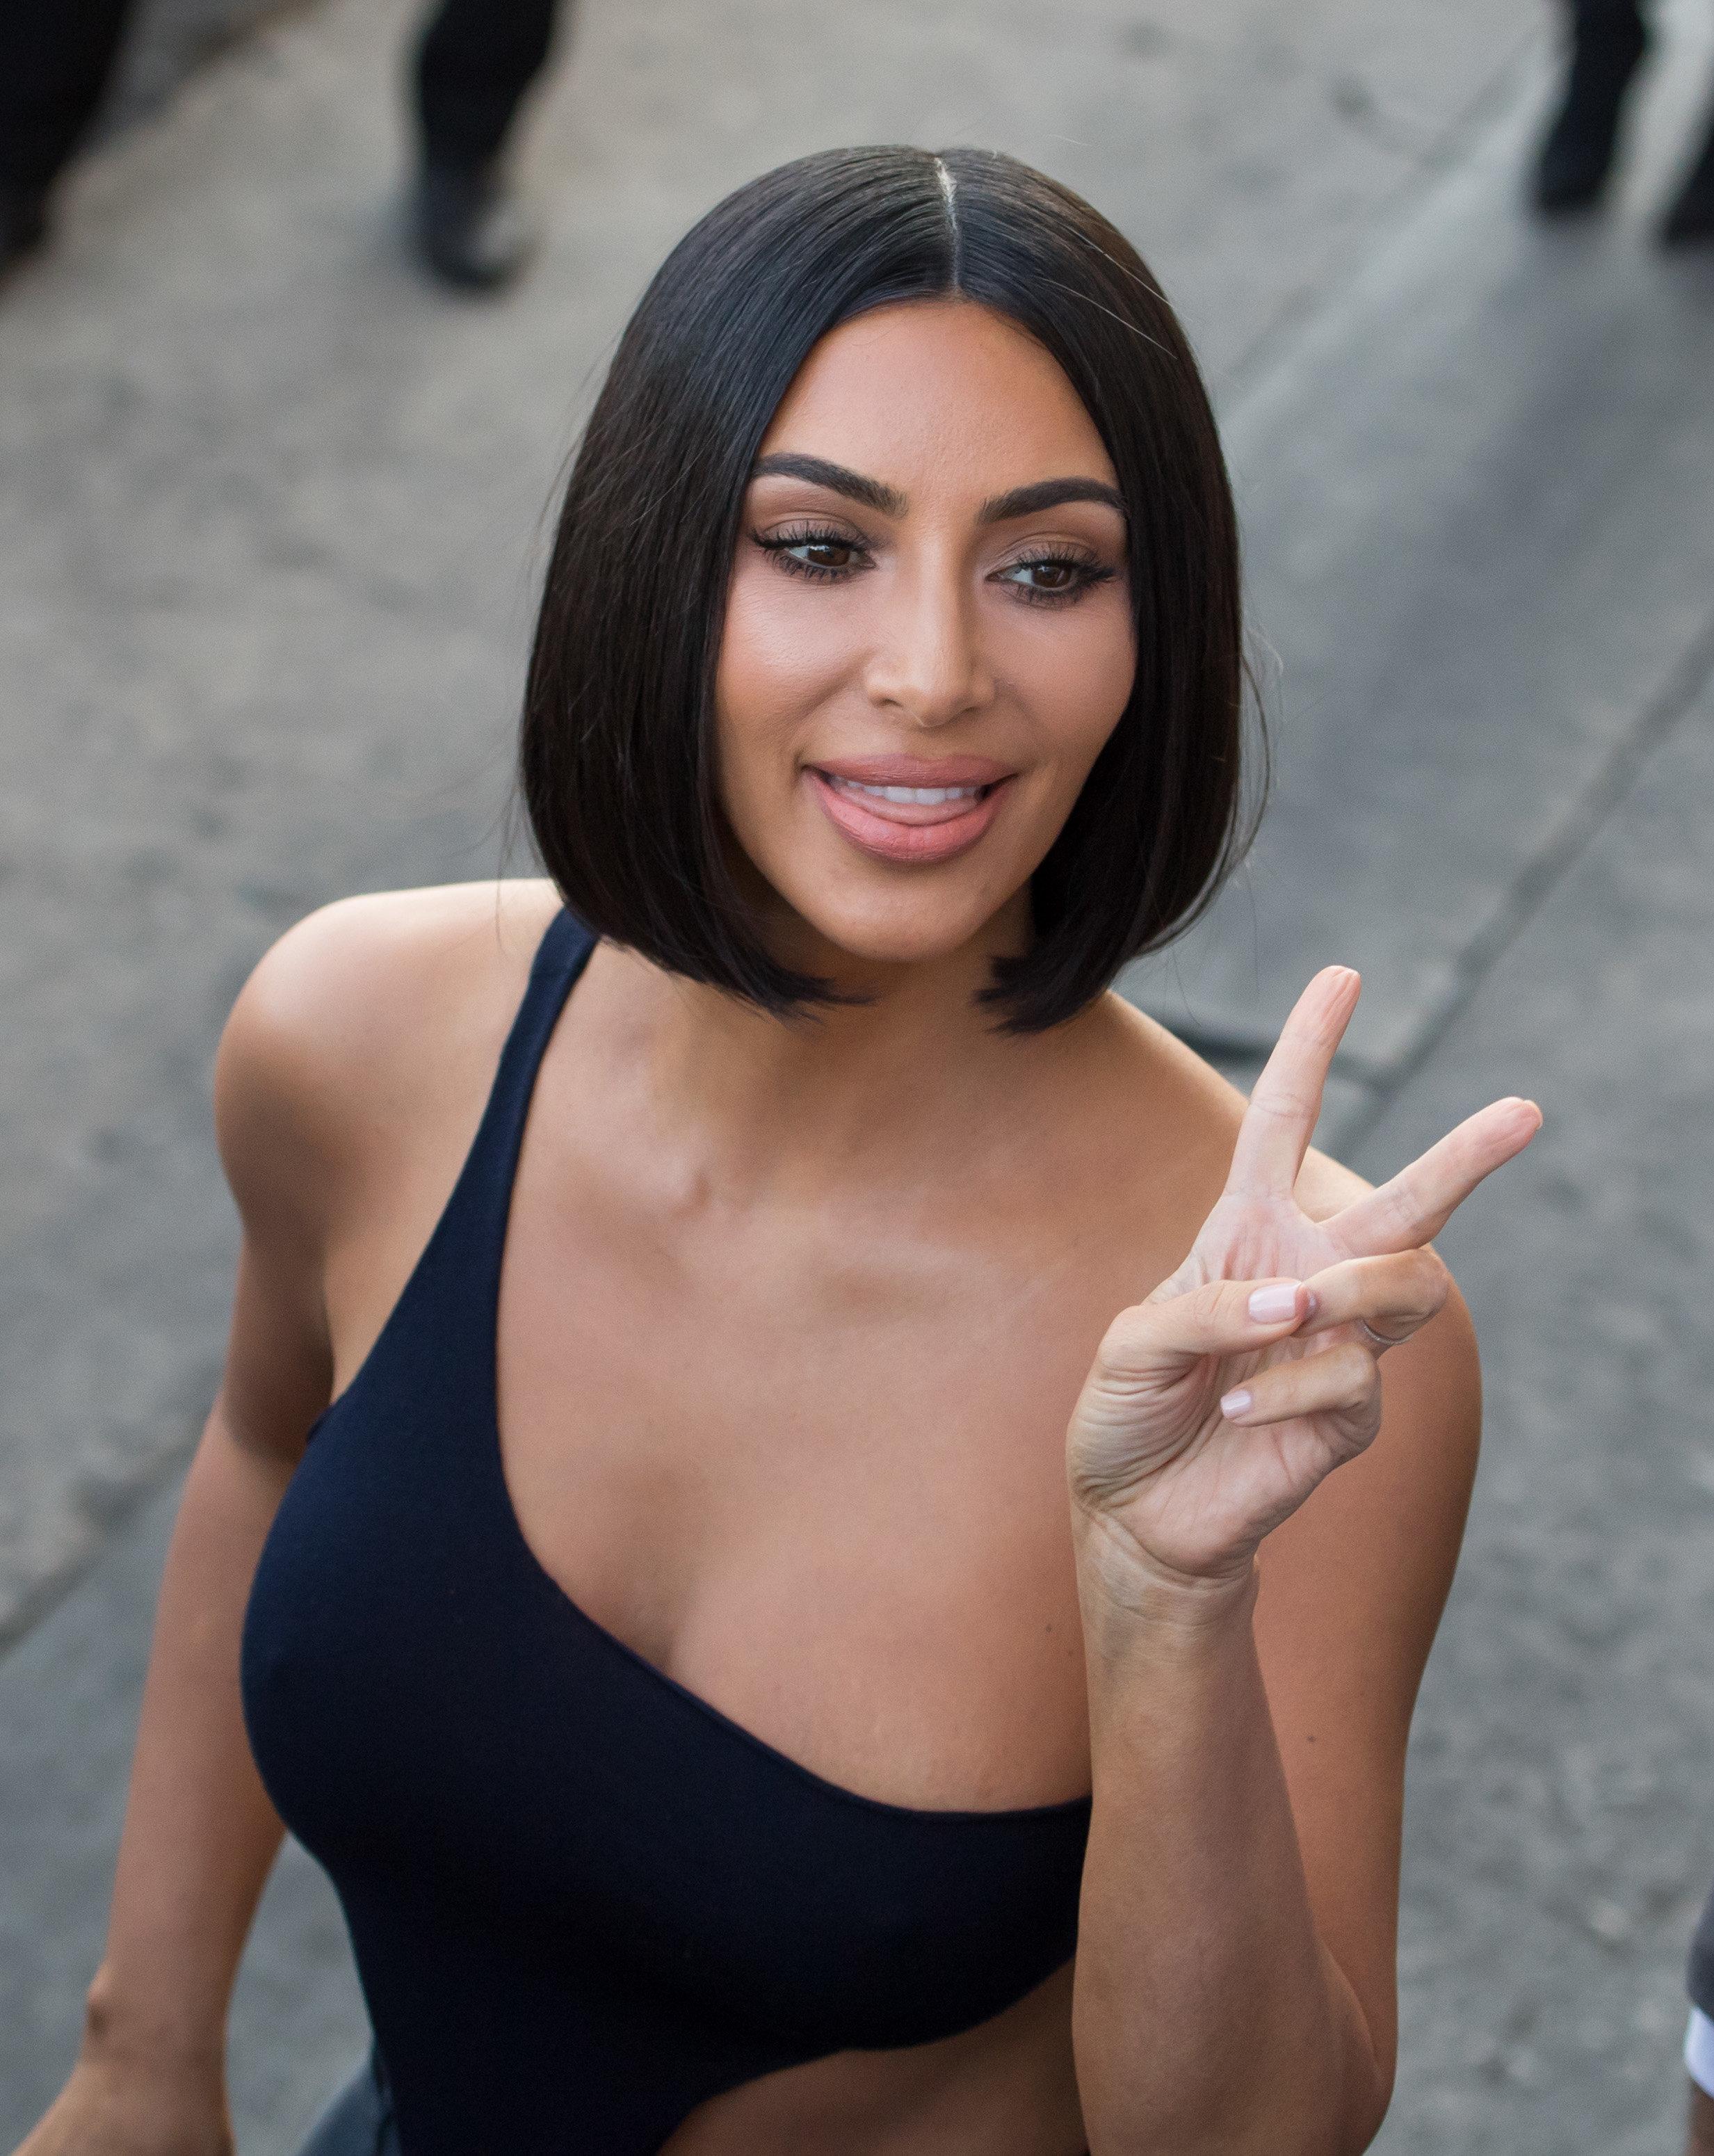 Kim Kardashian's Awkward Photo Shoot Becomes A Priceless New